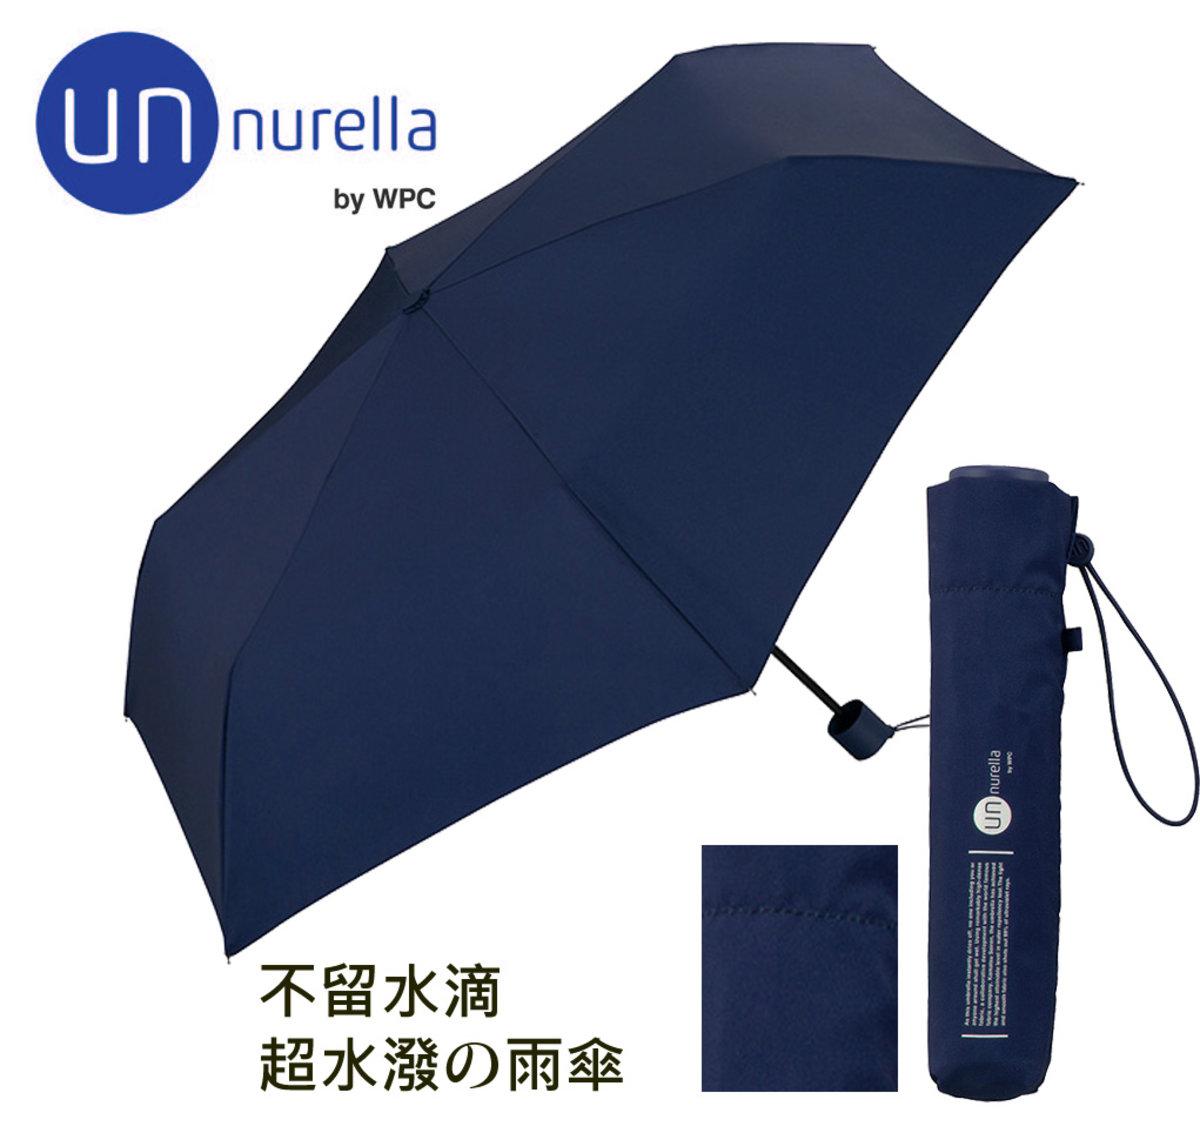 Clear all rain drop in a second ‧ Umbrella specialist from Japan - Unnurella by WPC UN-106-NV Folding Umbrella